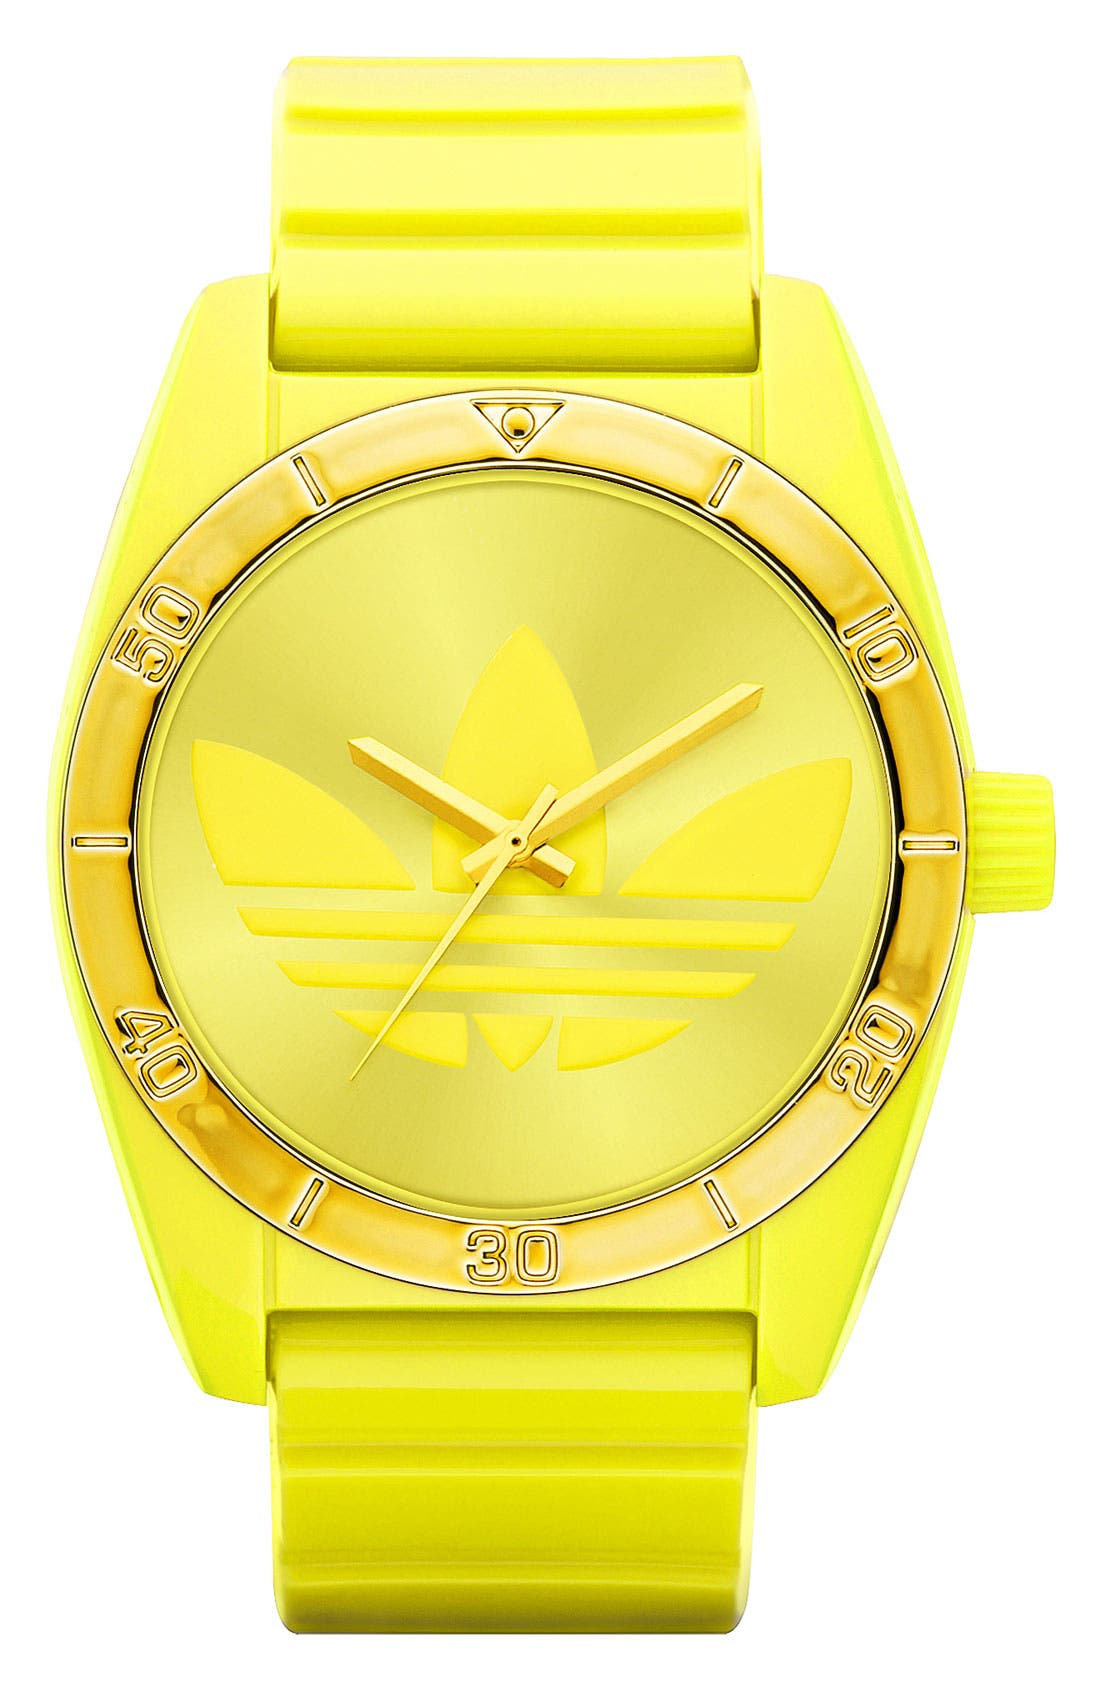 Main Image - adidas Originals 'Santiago' Neon Watch, 42mm